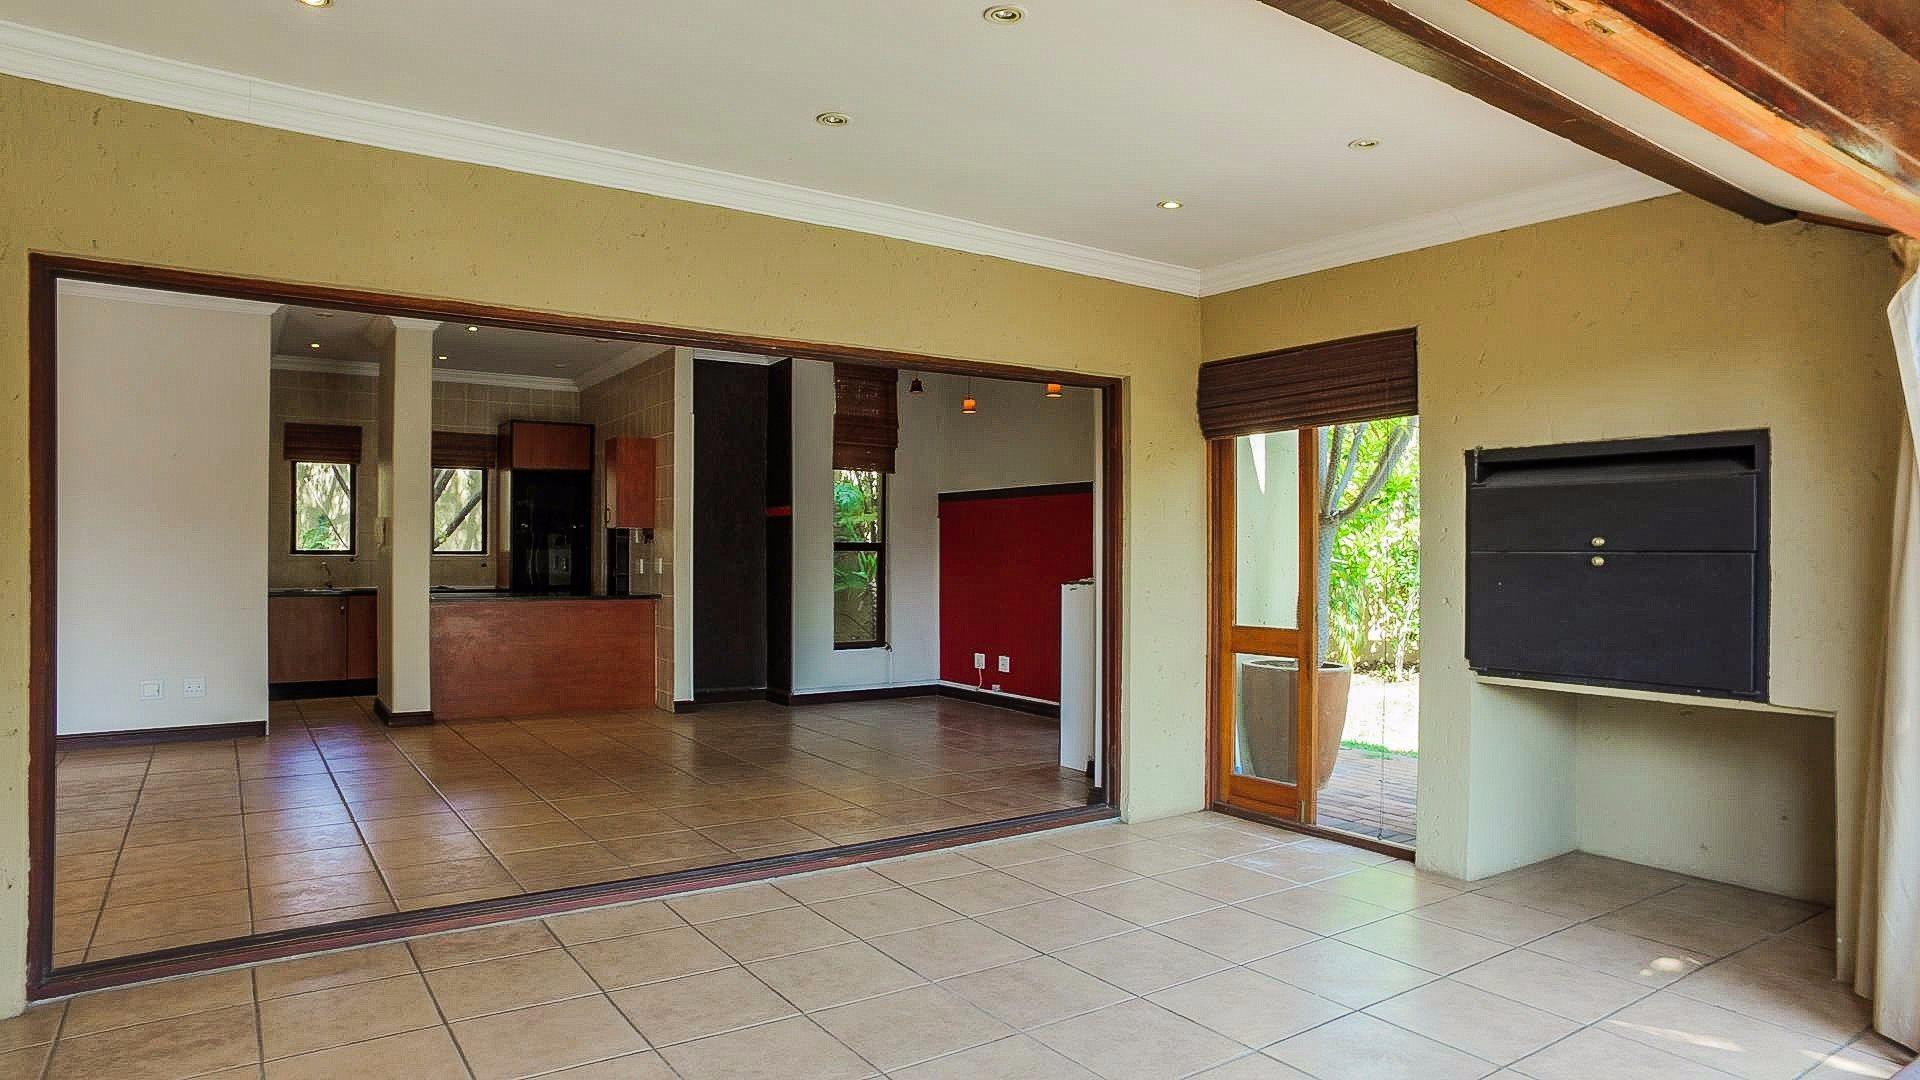 Irene View Estate property for sale. Ref No: 13519995. Picture no 11